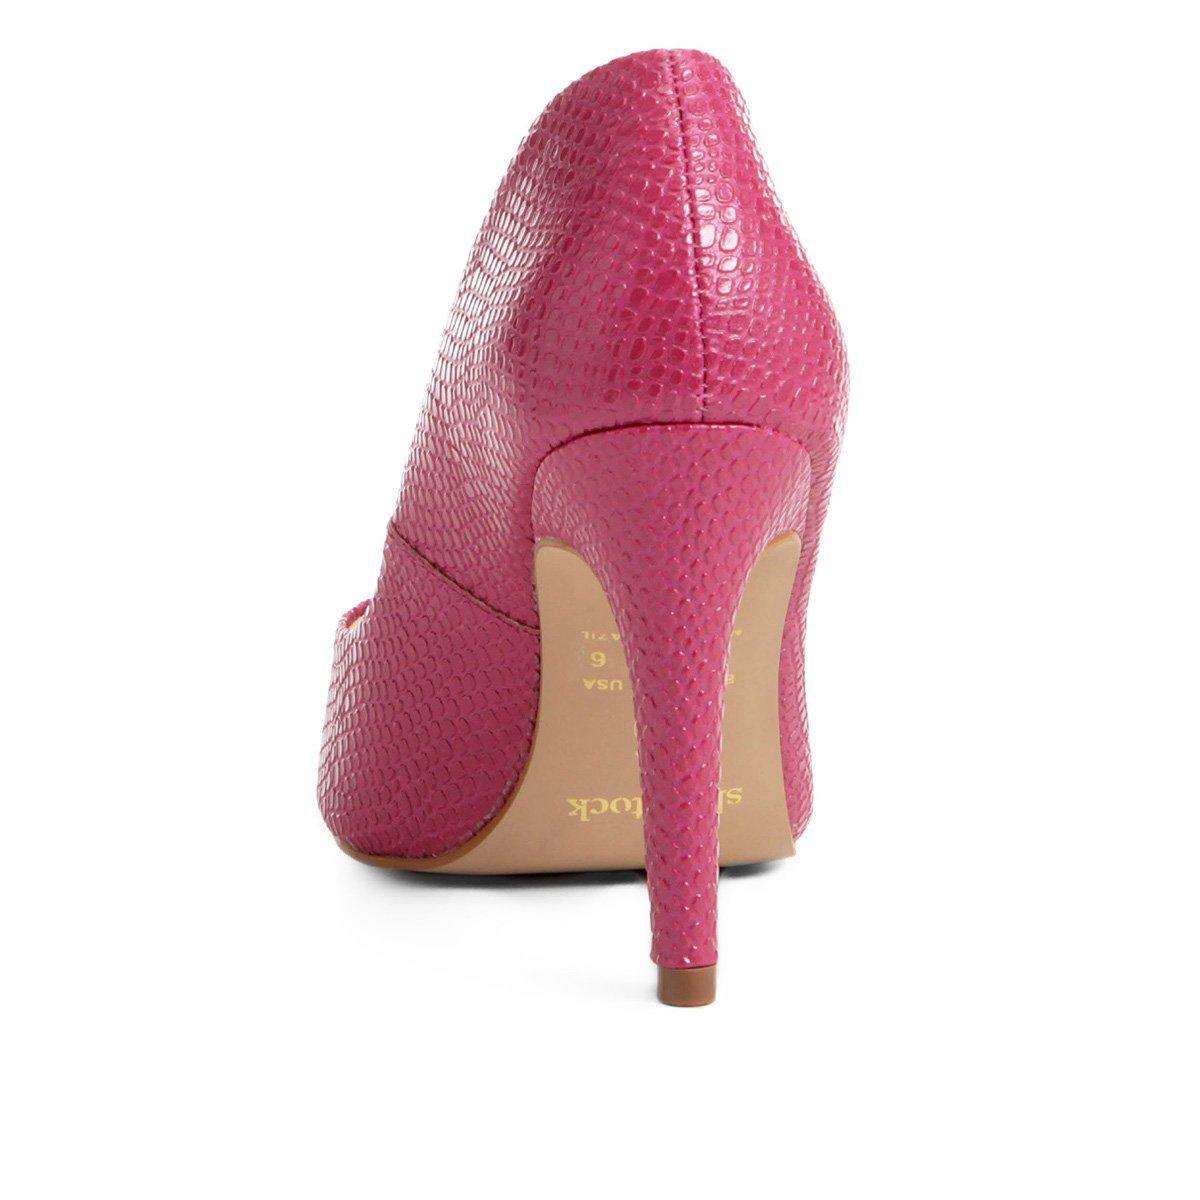 Salto Alto Pink Scarpin Shoestock Shoestock Serpente Scarpin qUOSxZ4t